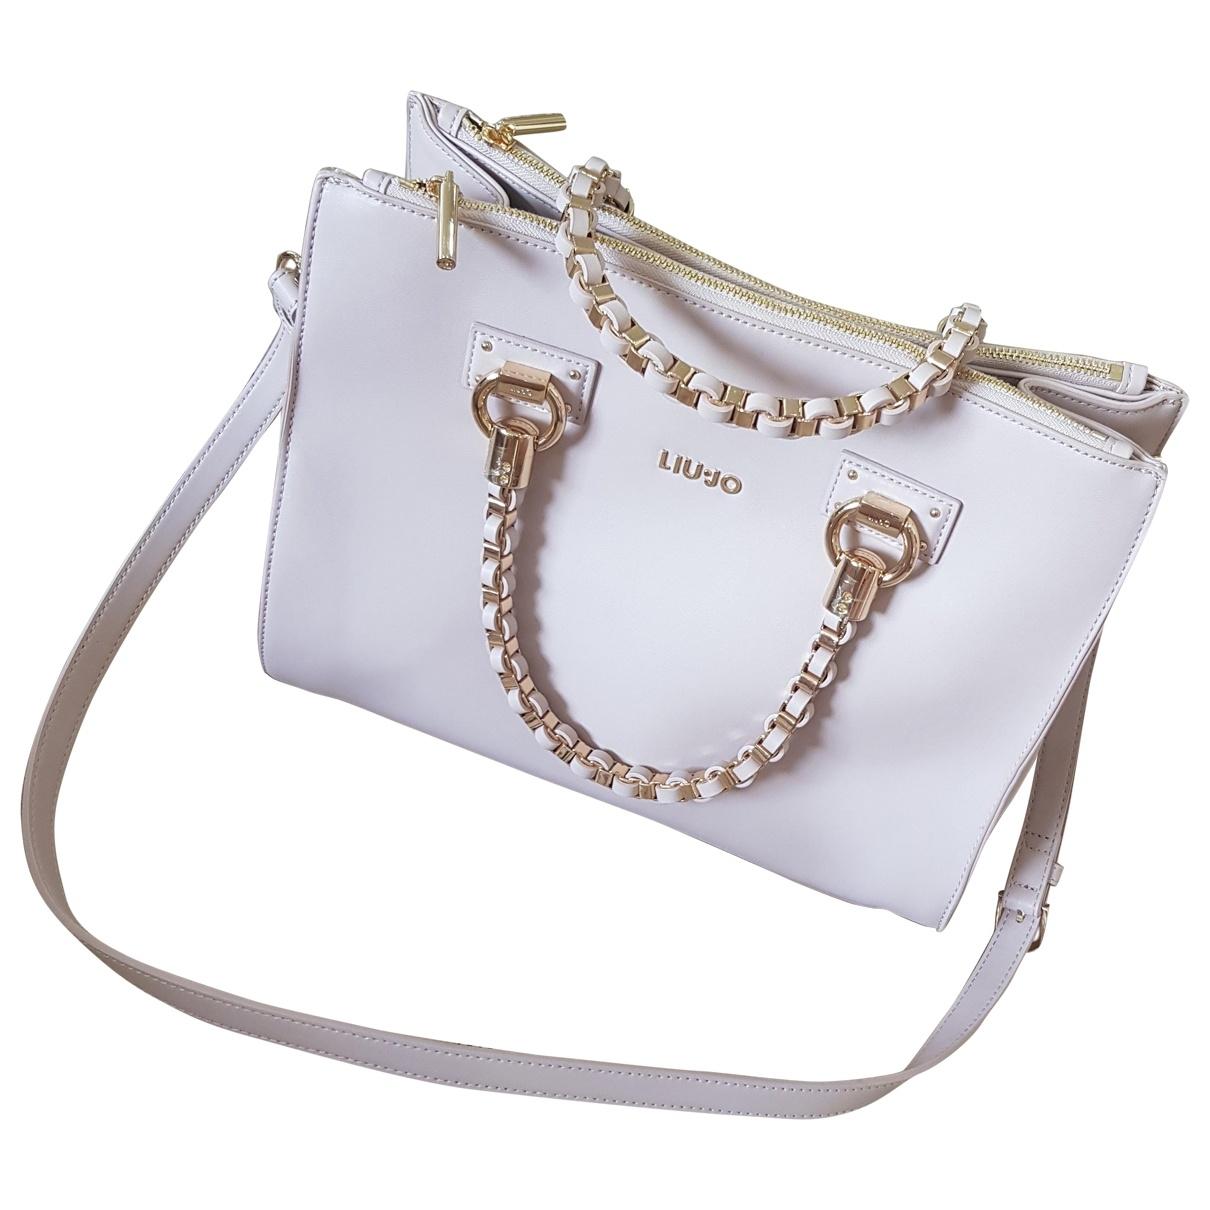 Liu.jo \N Pink Leather handbag for Women \N